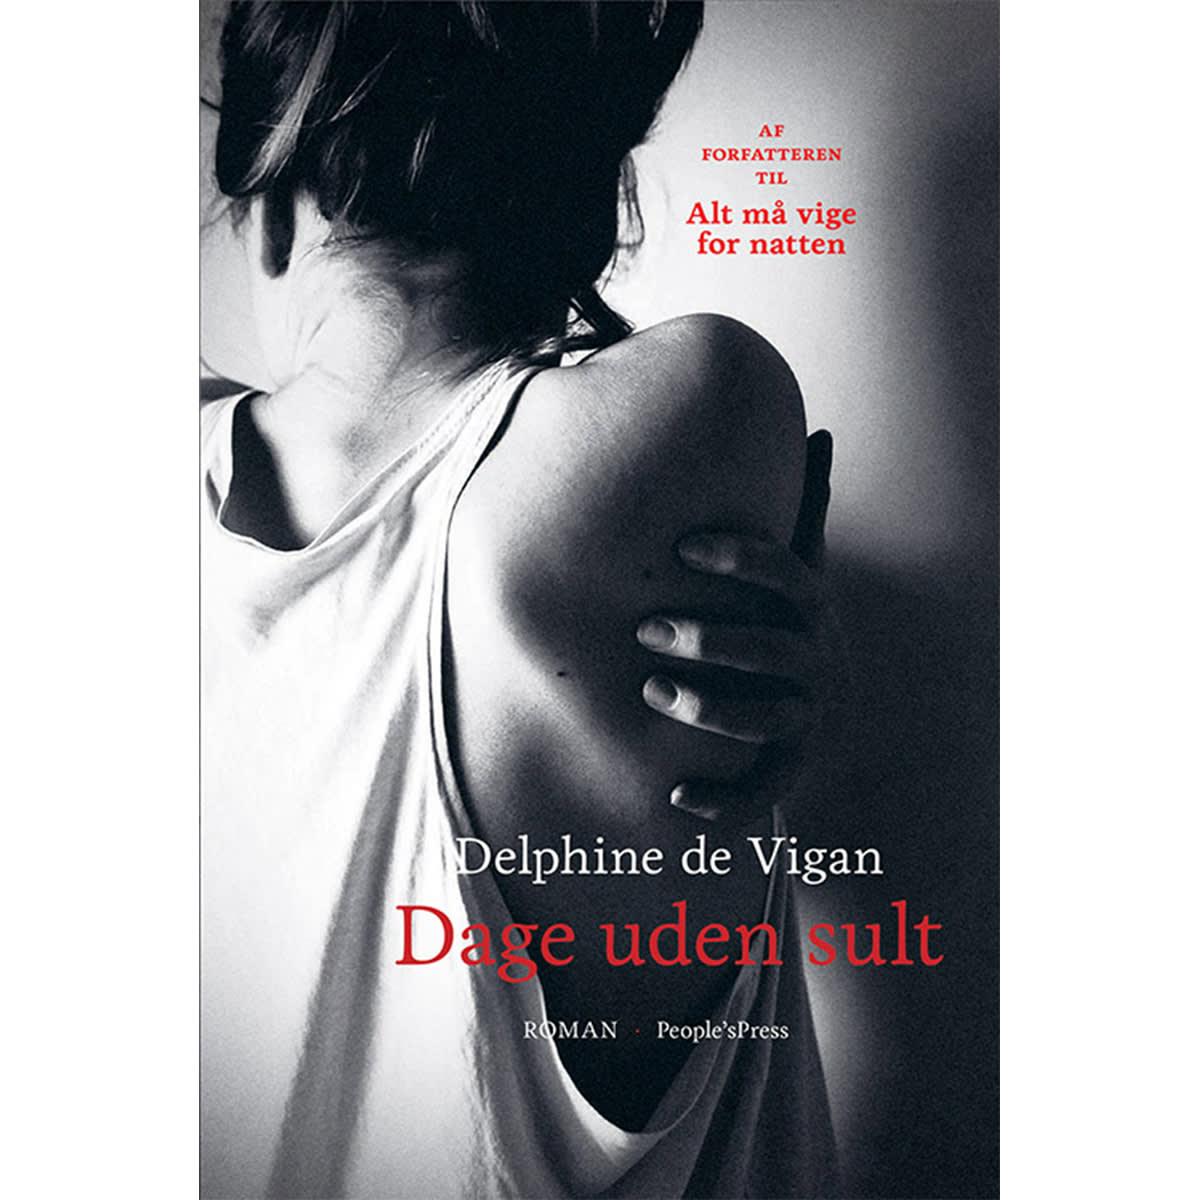 Af Delphine de Vigan